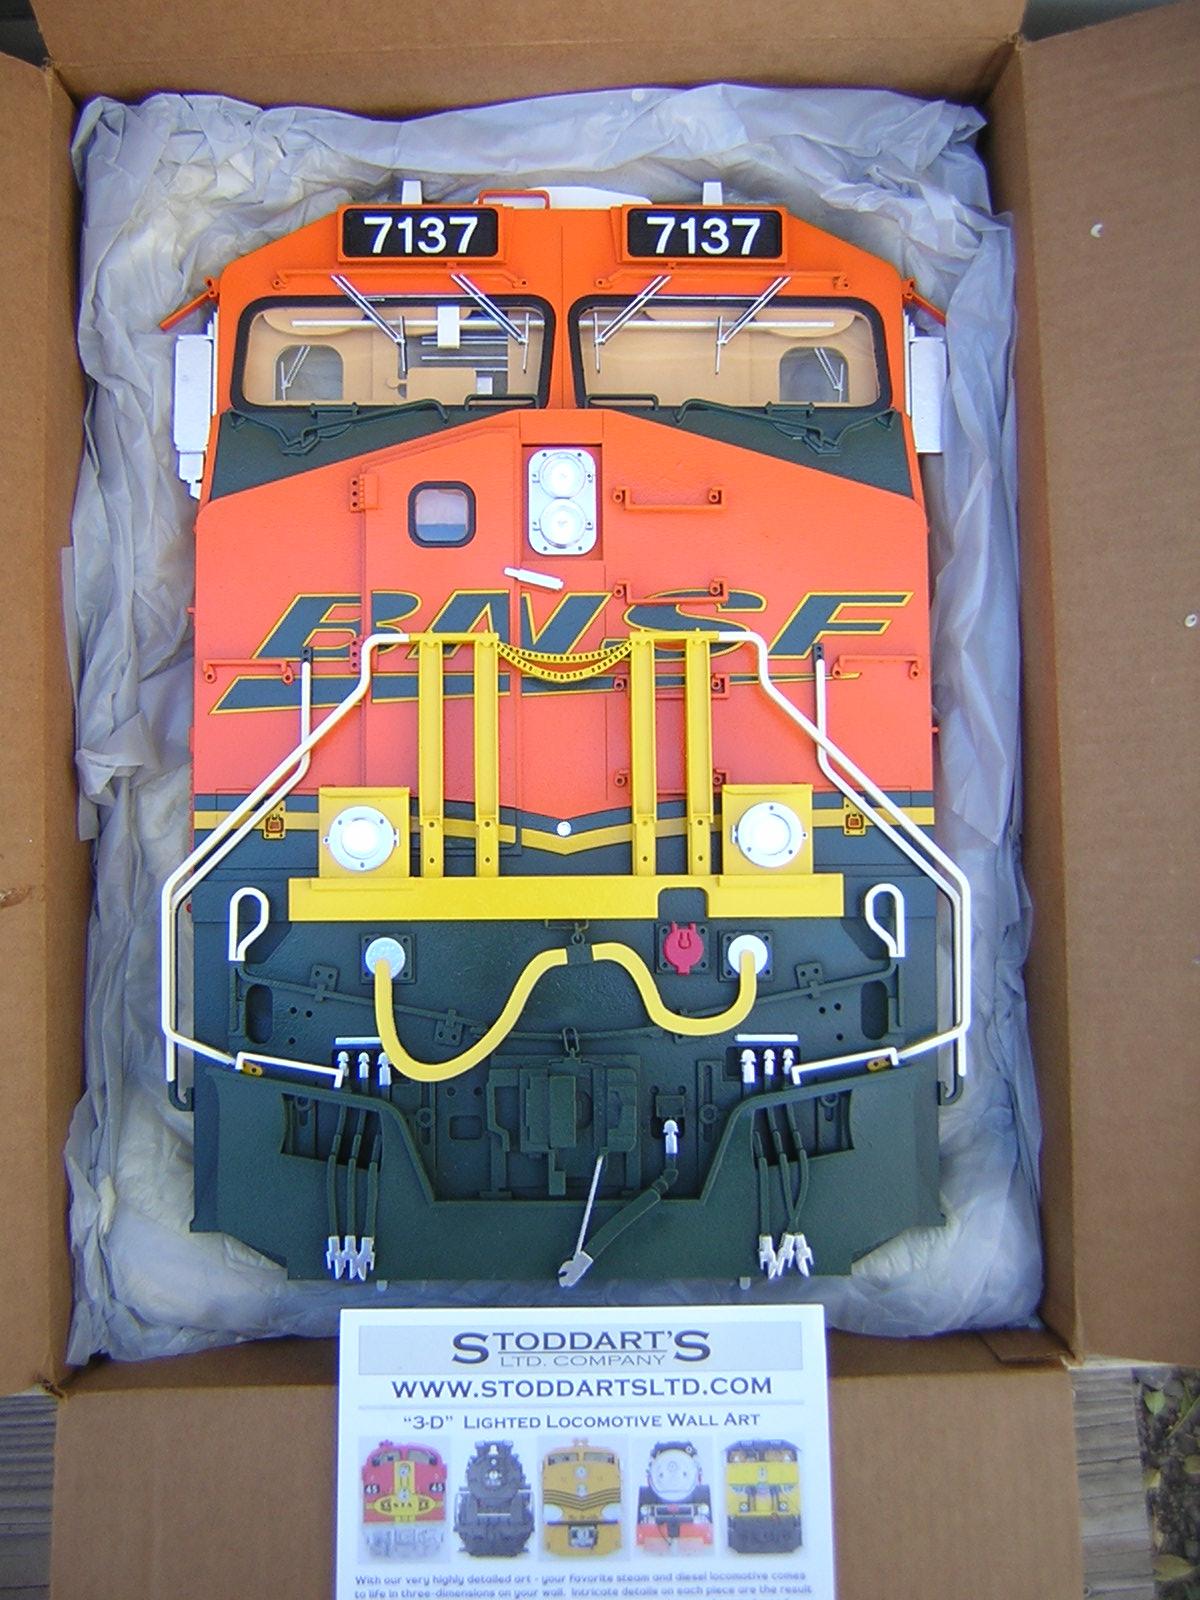 Train Wall Art railroad wall artwork | trainboard - the internet's original